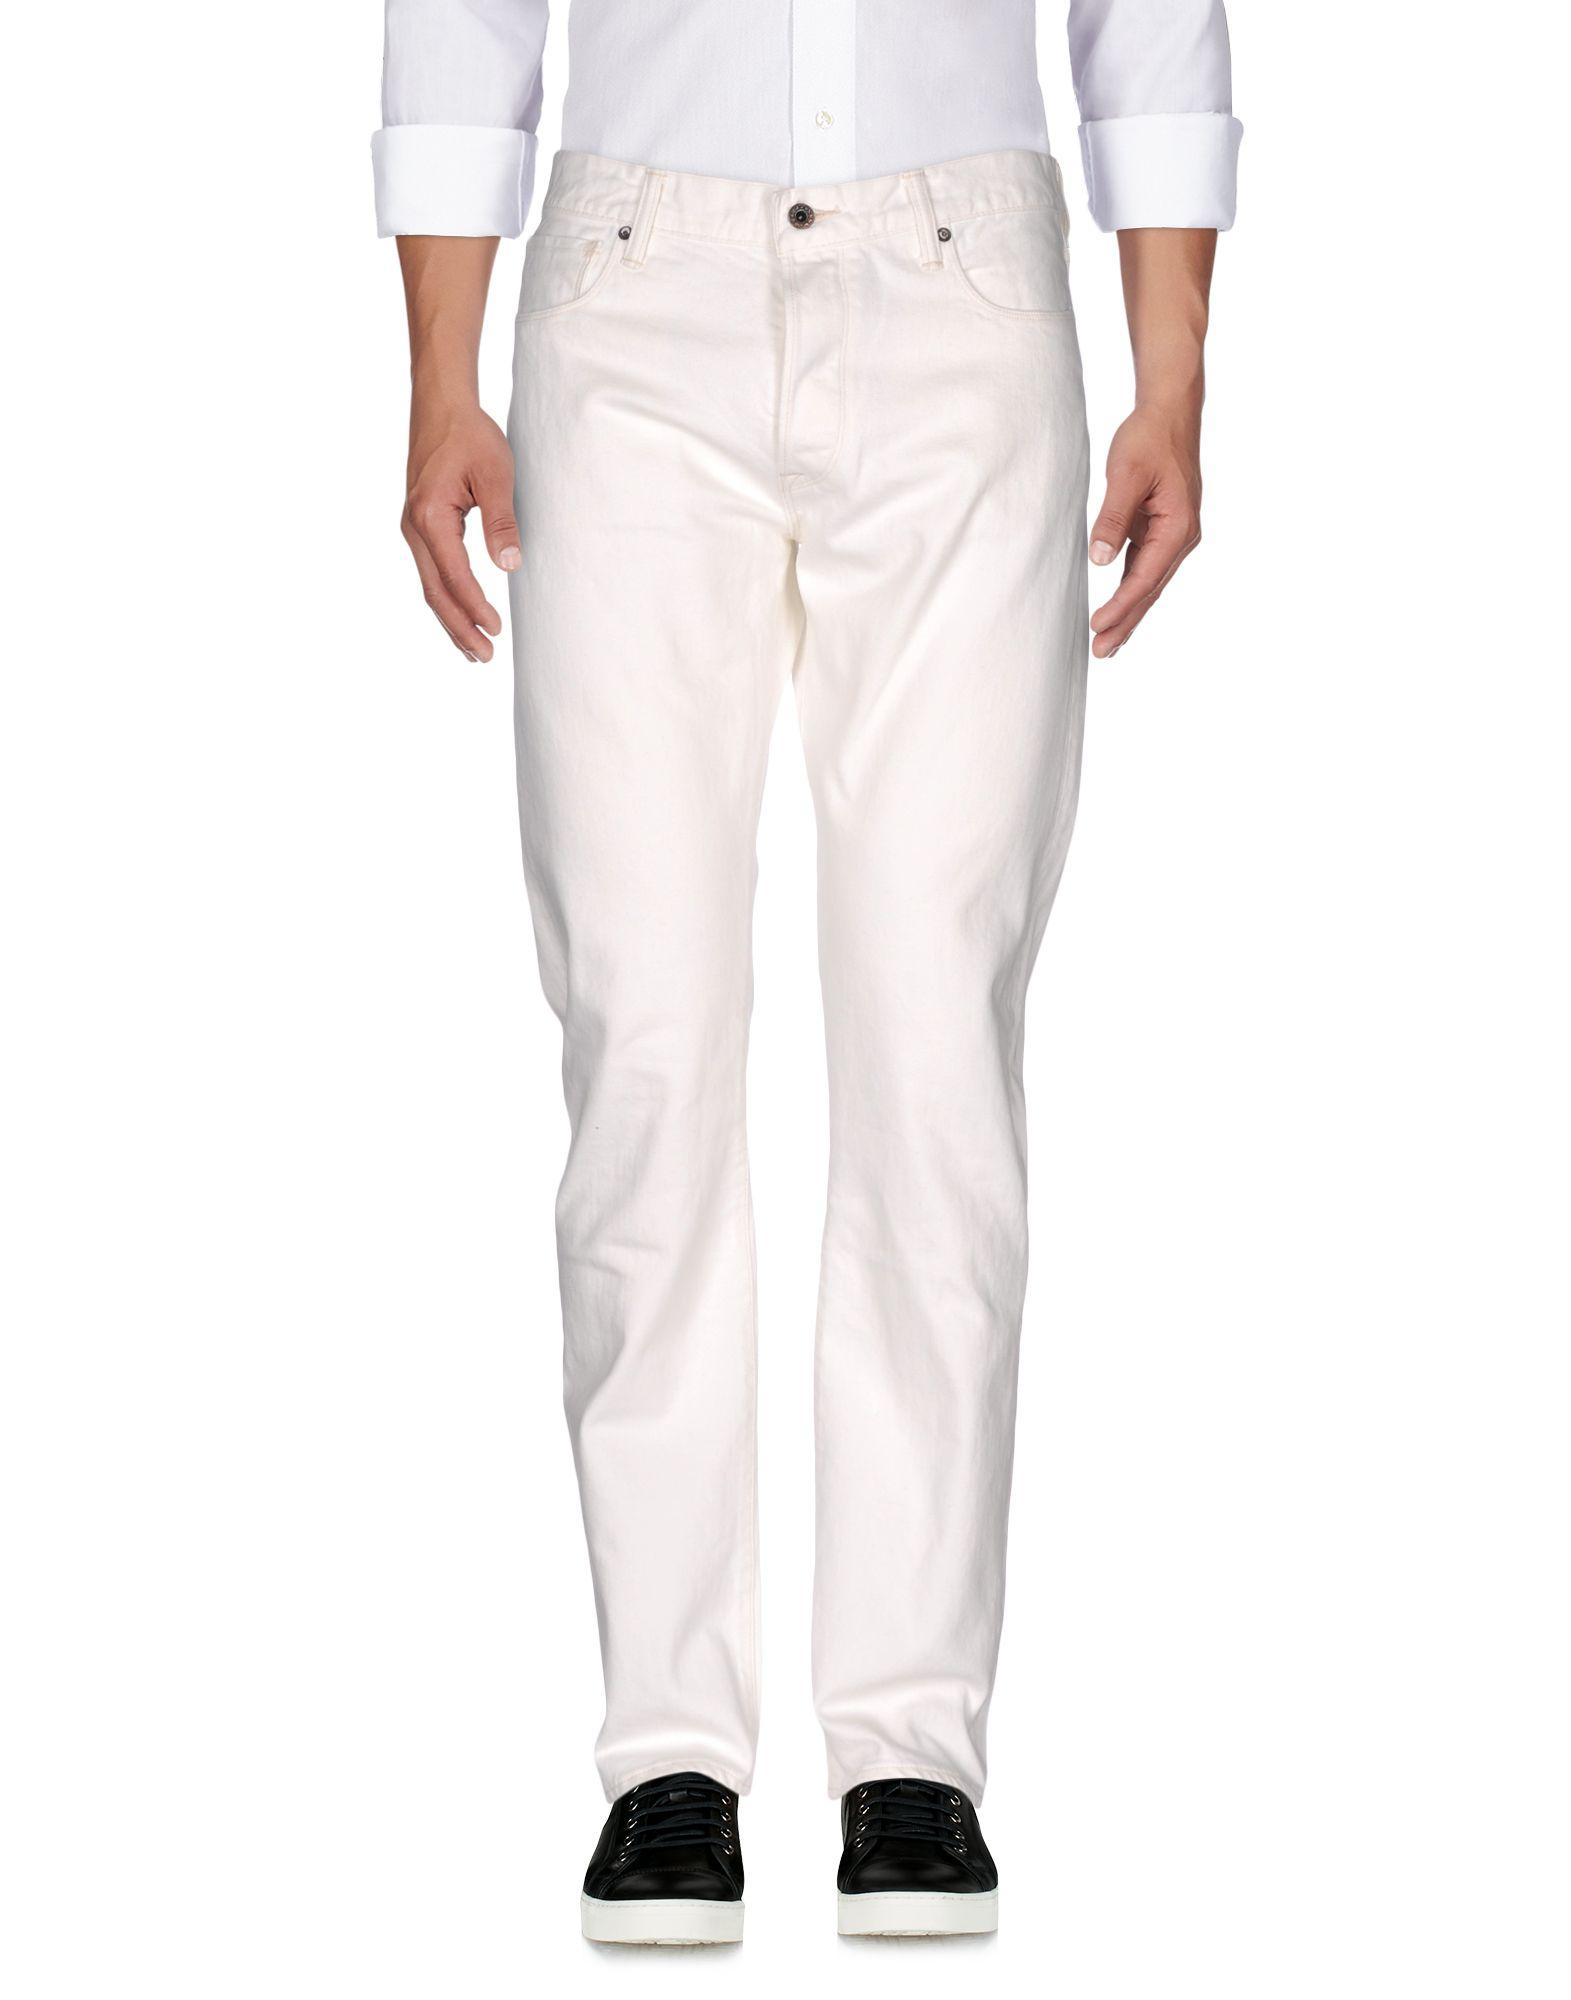 KURO Denim Pants in Ivory